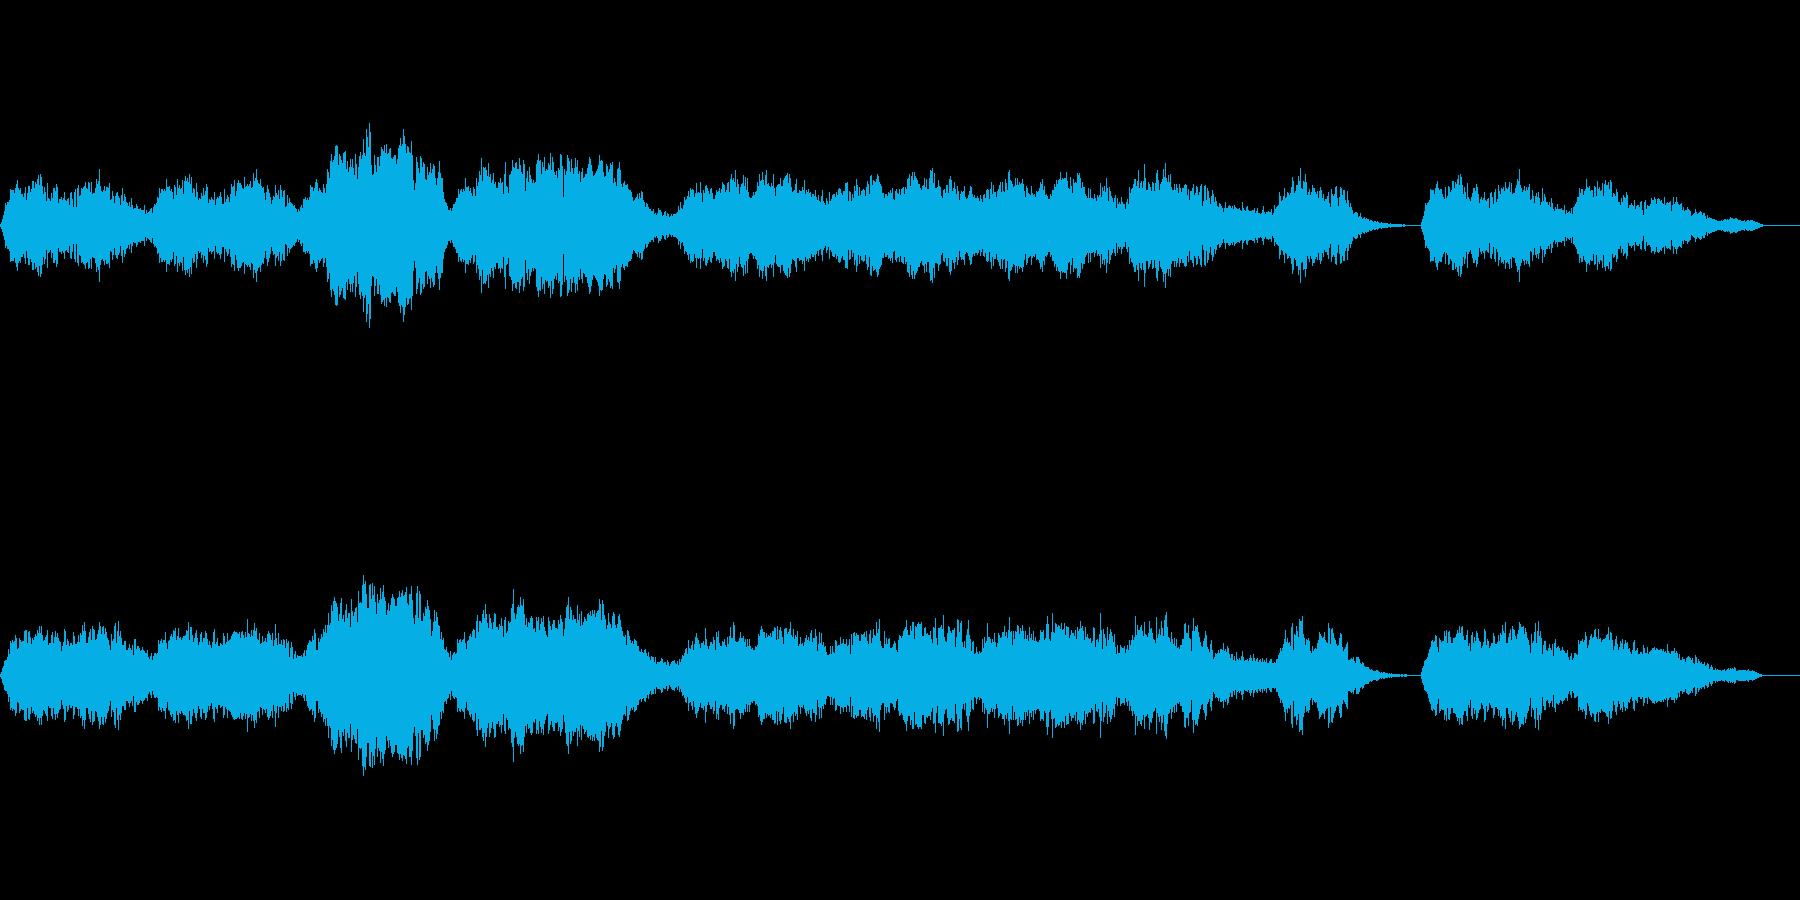 RPG:ダンジョン用BGM2の再生済みの波形